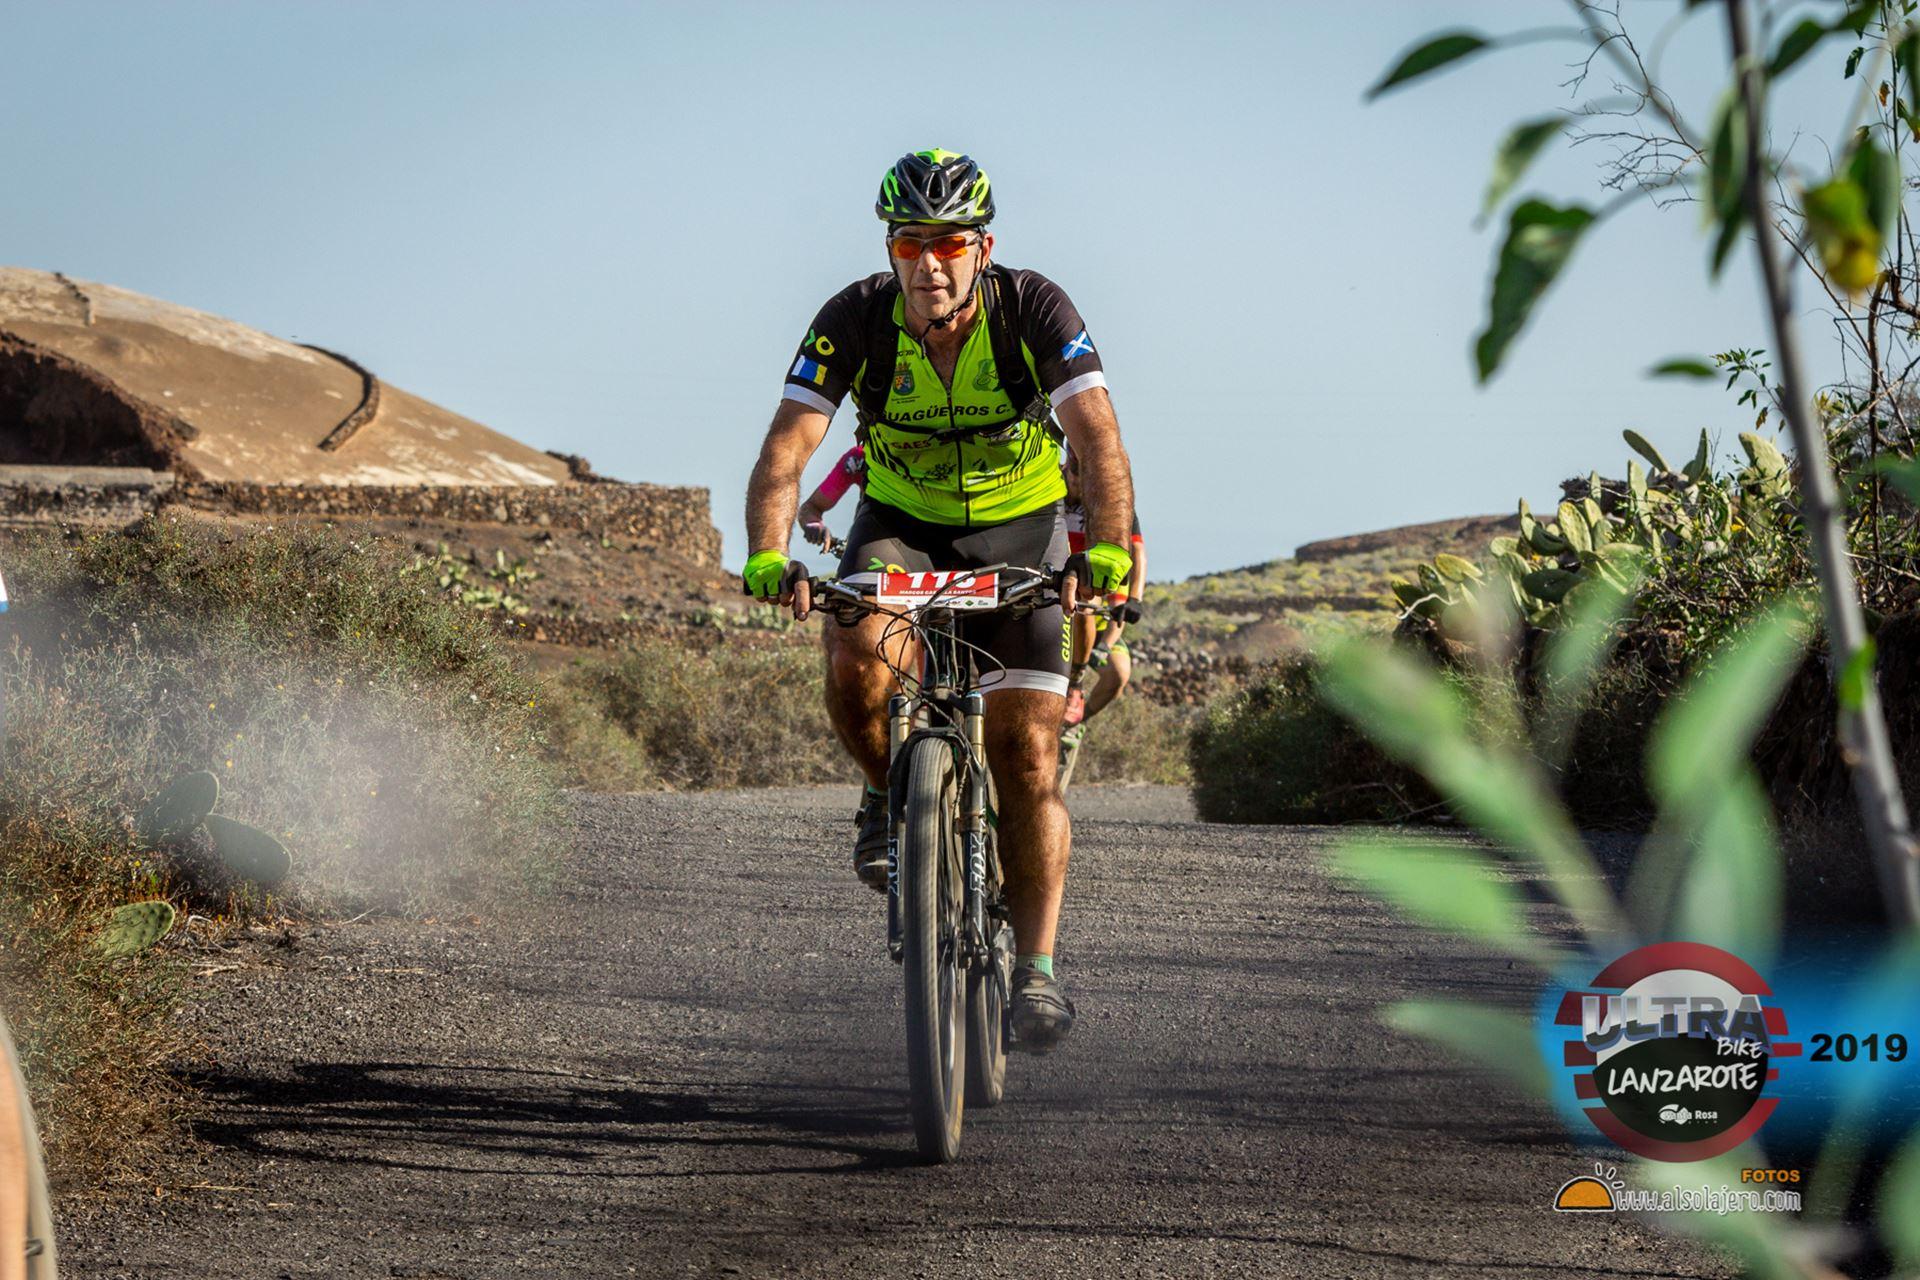 Sector Guatiza 2ª Etapa Ultrabike 2019 Fotos Alsolajero.com-131